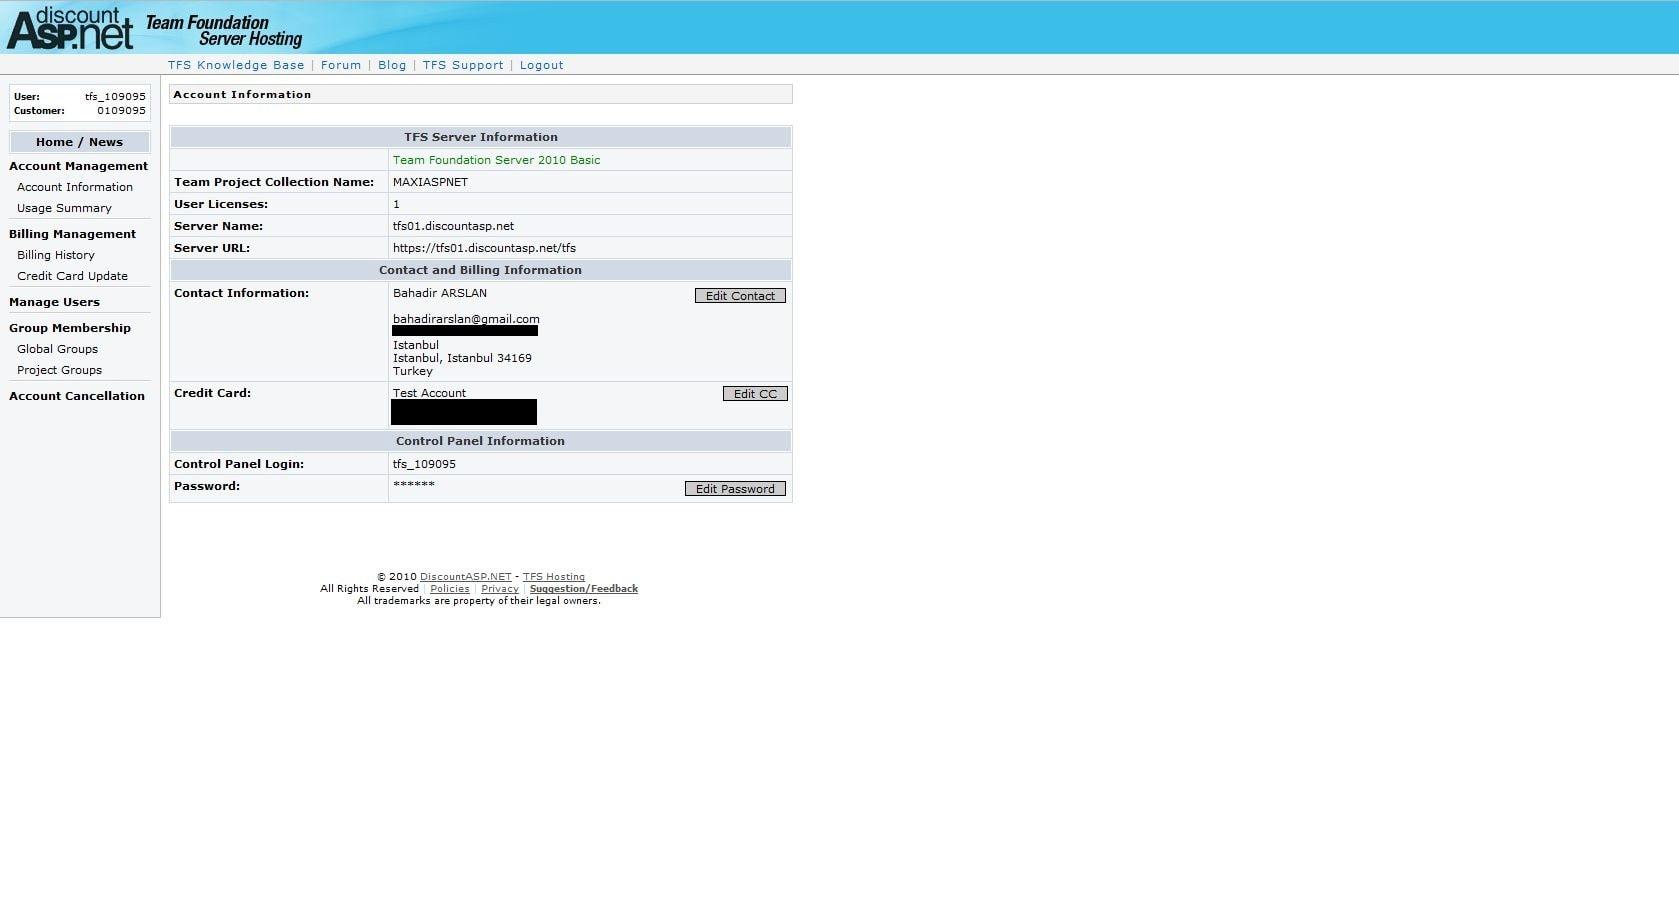 1315-Panel_DiscountASP_002.jpg